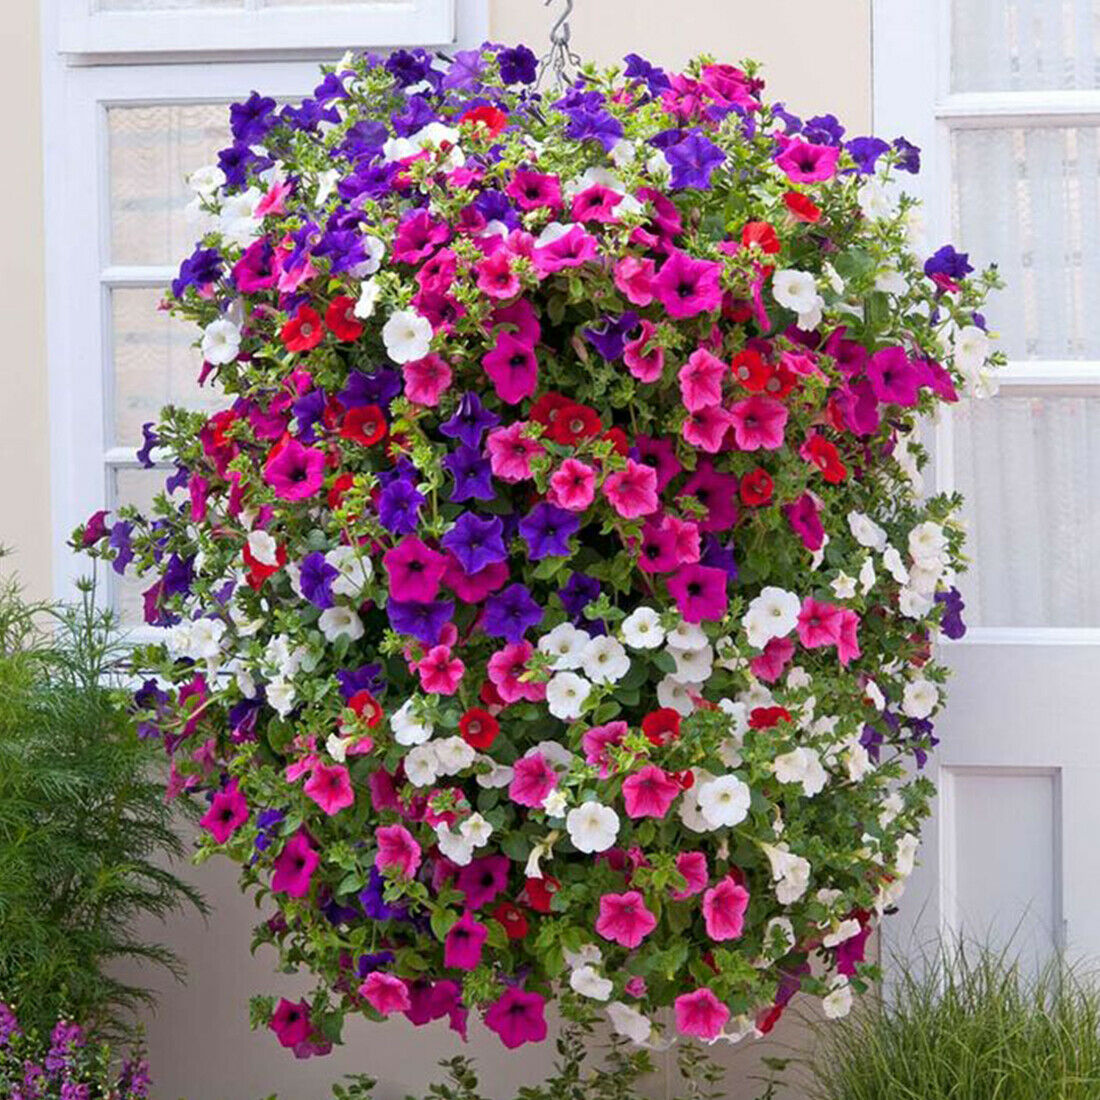 50 Trailing Petunia Colourful Mix Seeds Hanging Basket Window Box Planter Flower